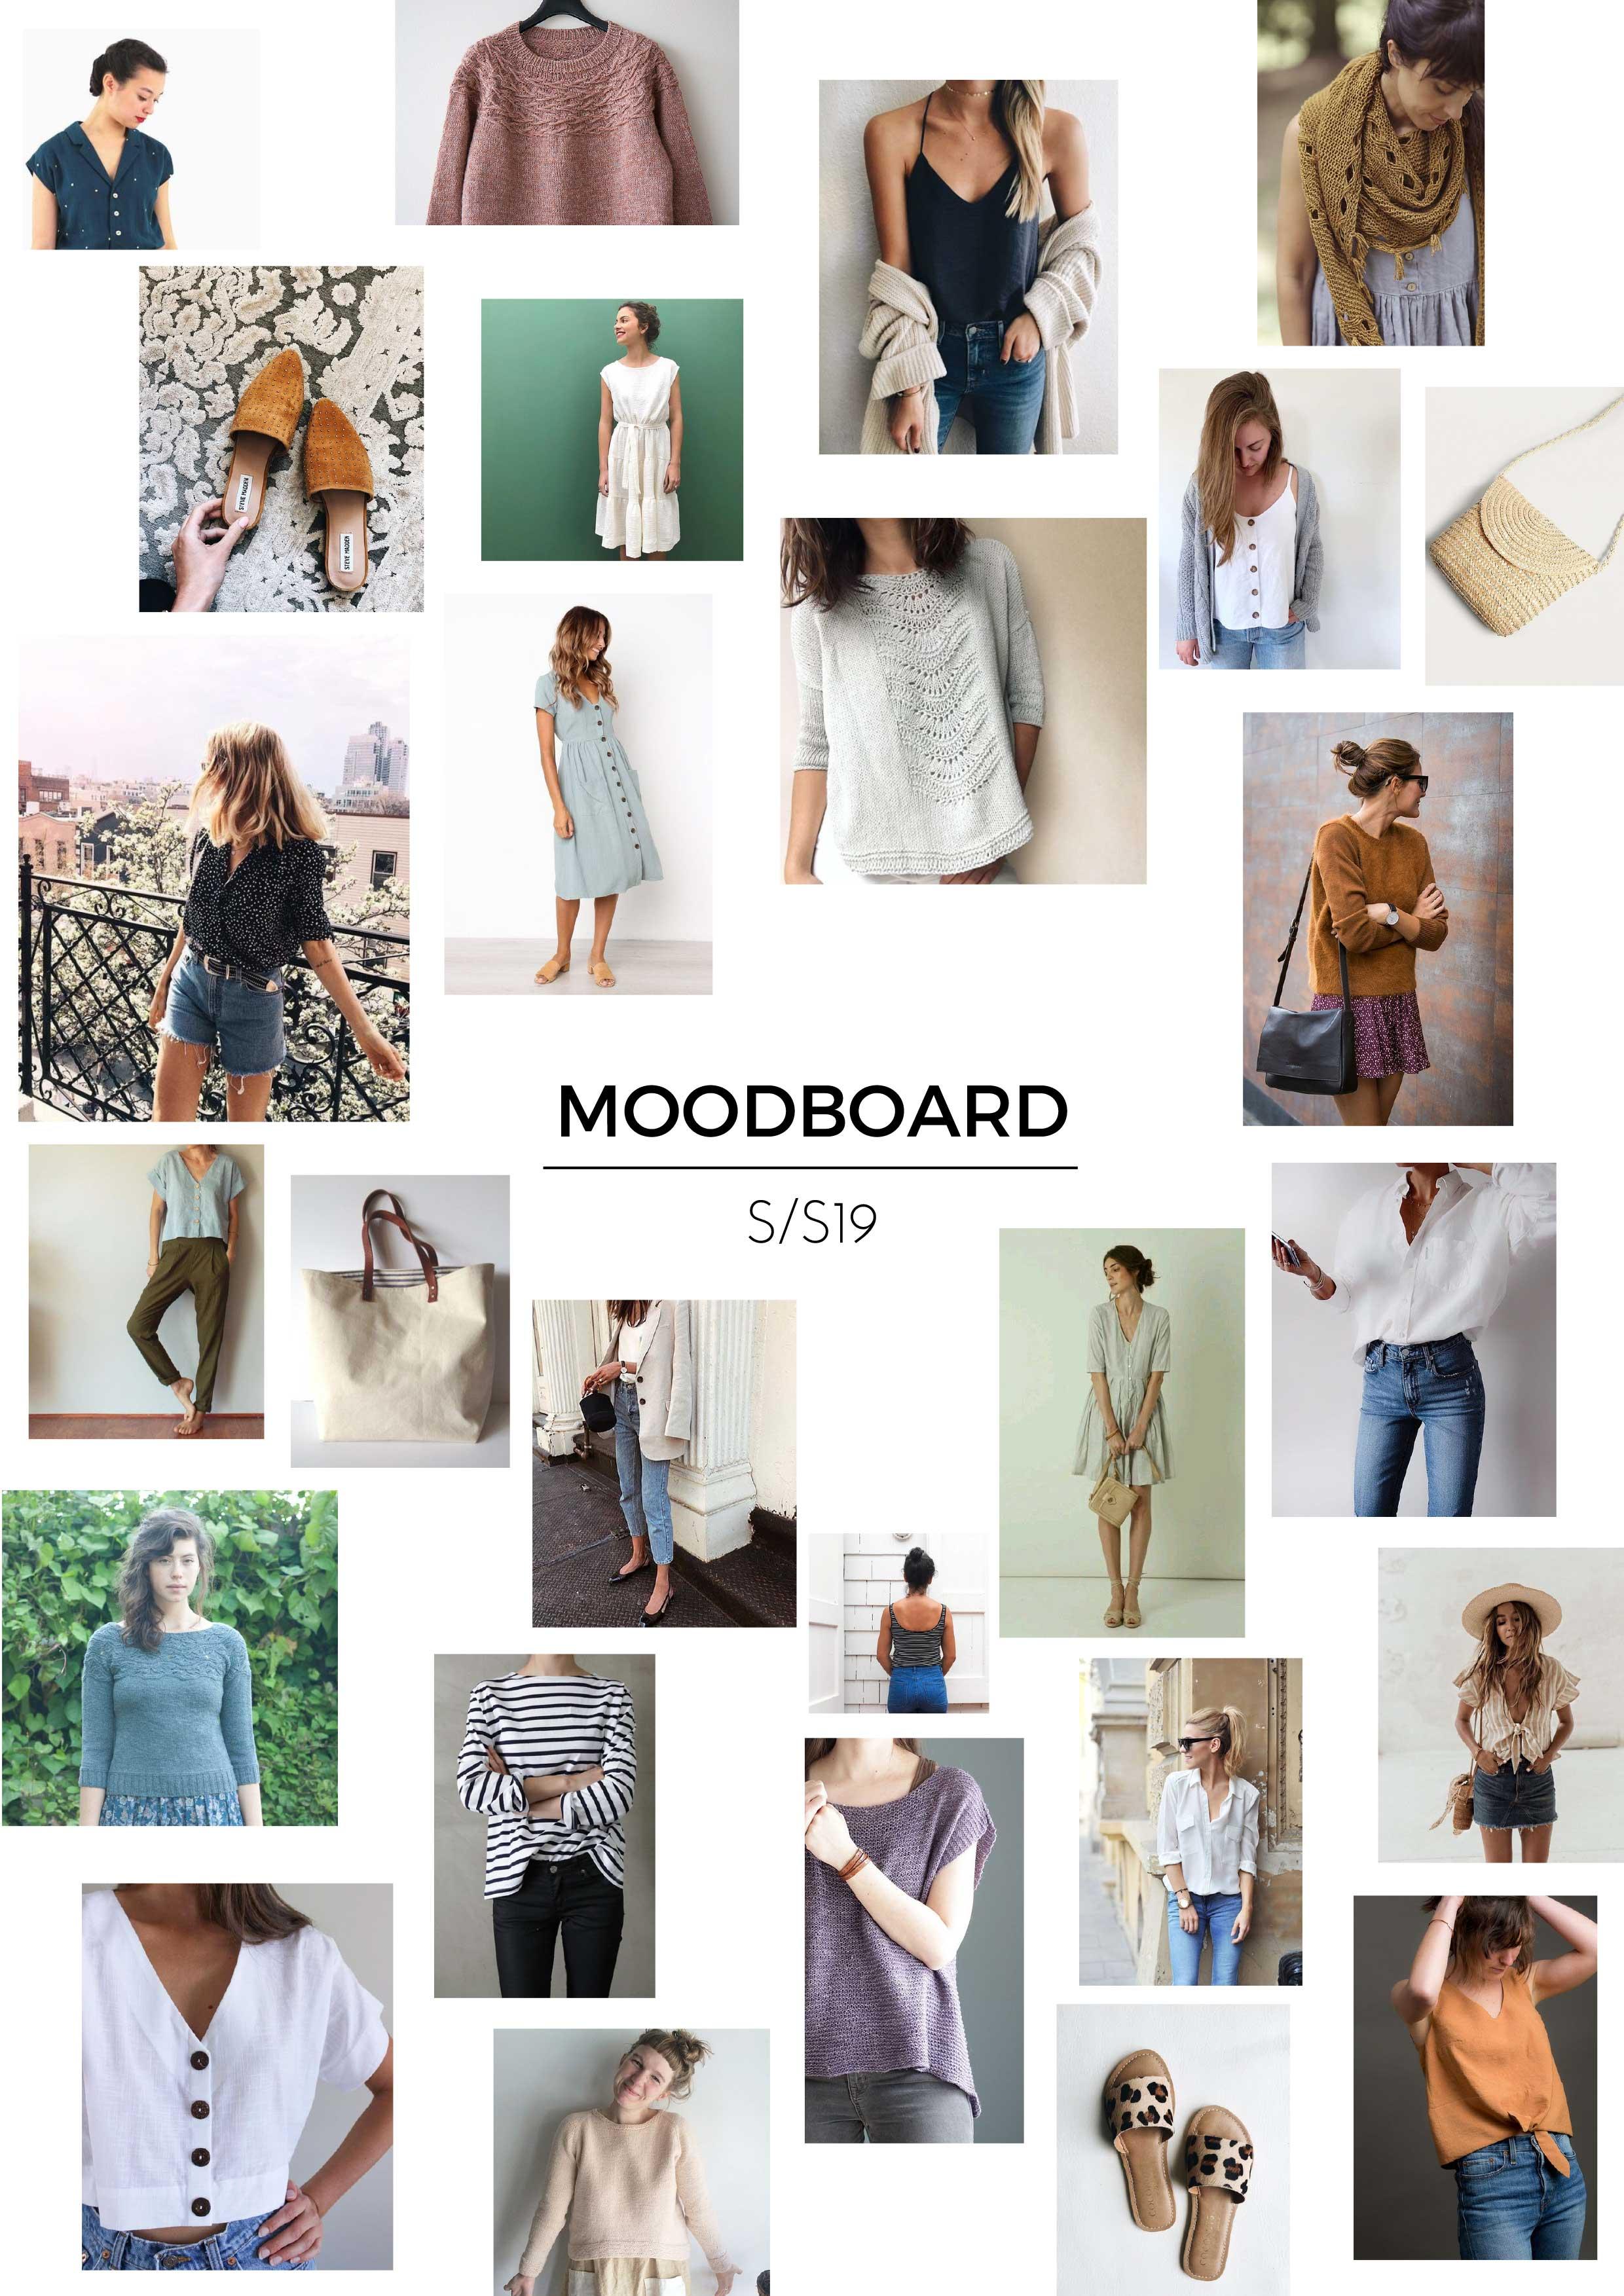 s_s19-Moodboard.jpg